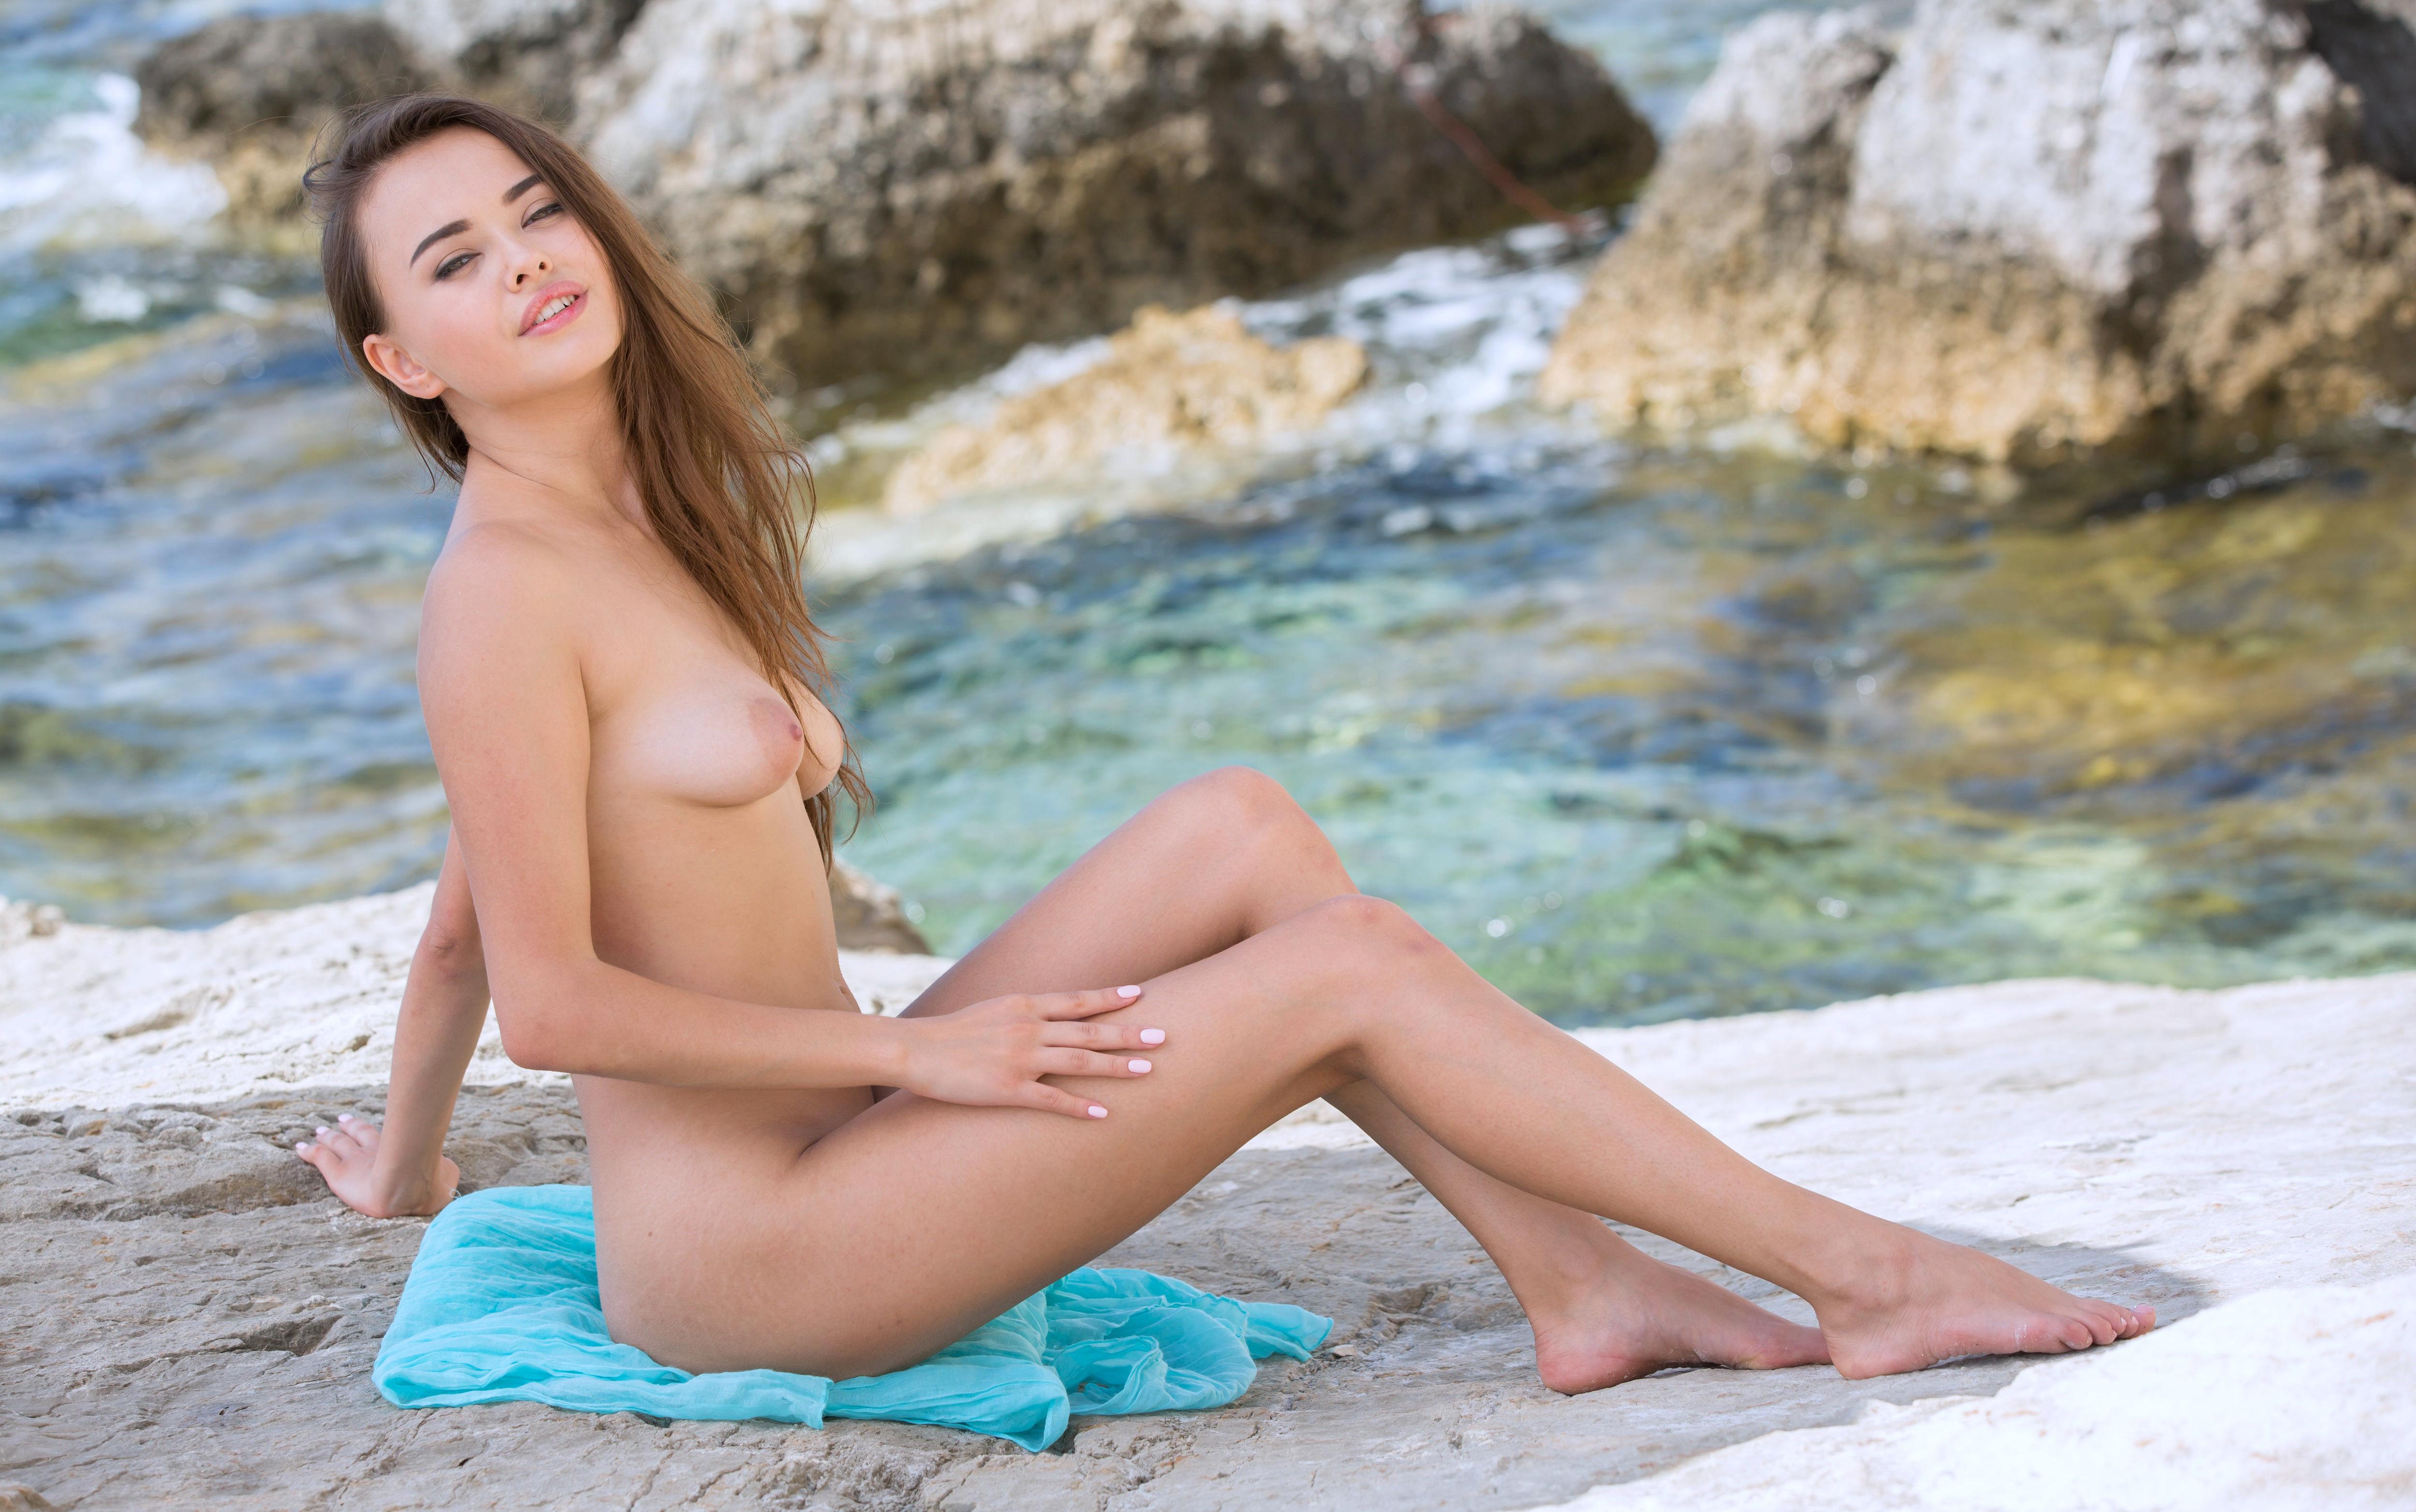 Kourtney kardashian says she feels the most desirable when she's naked